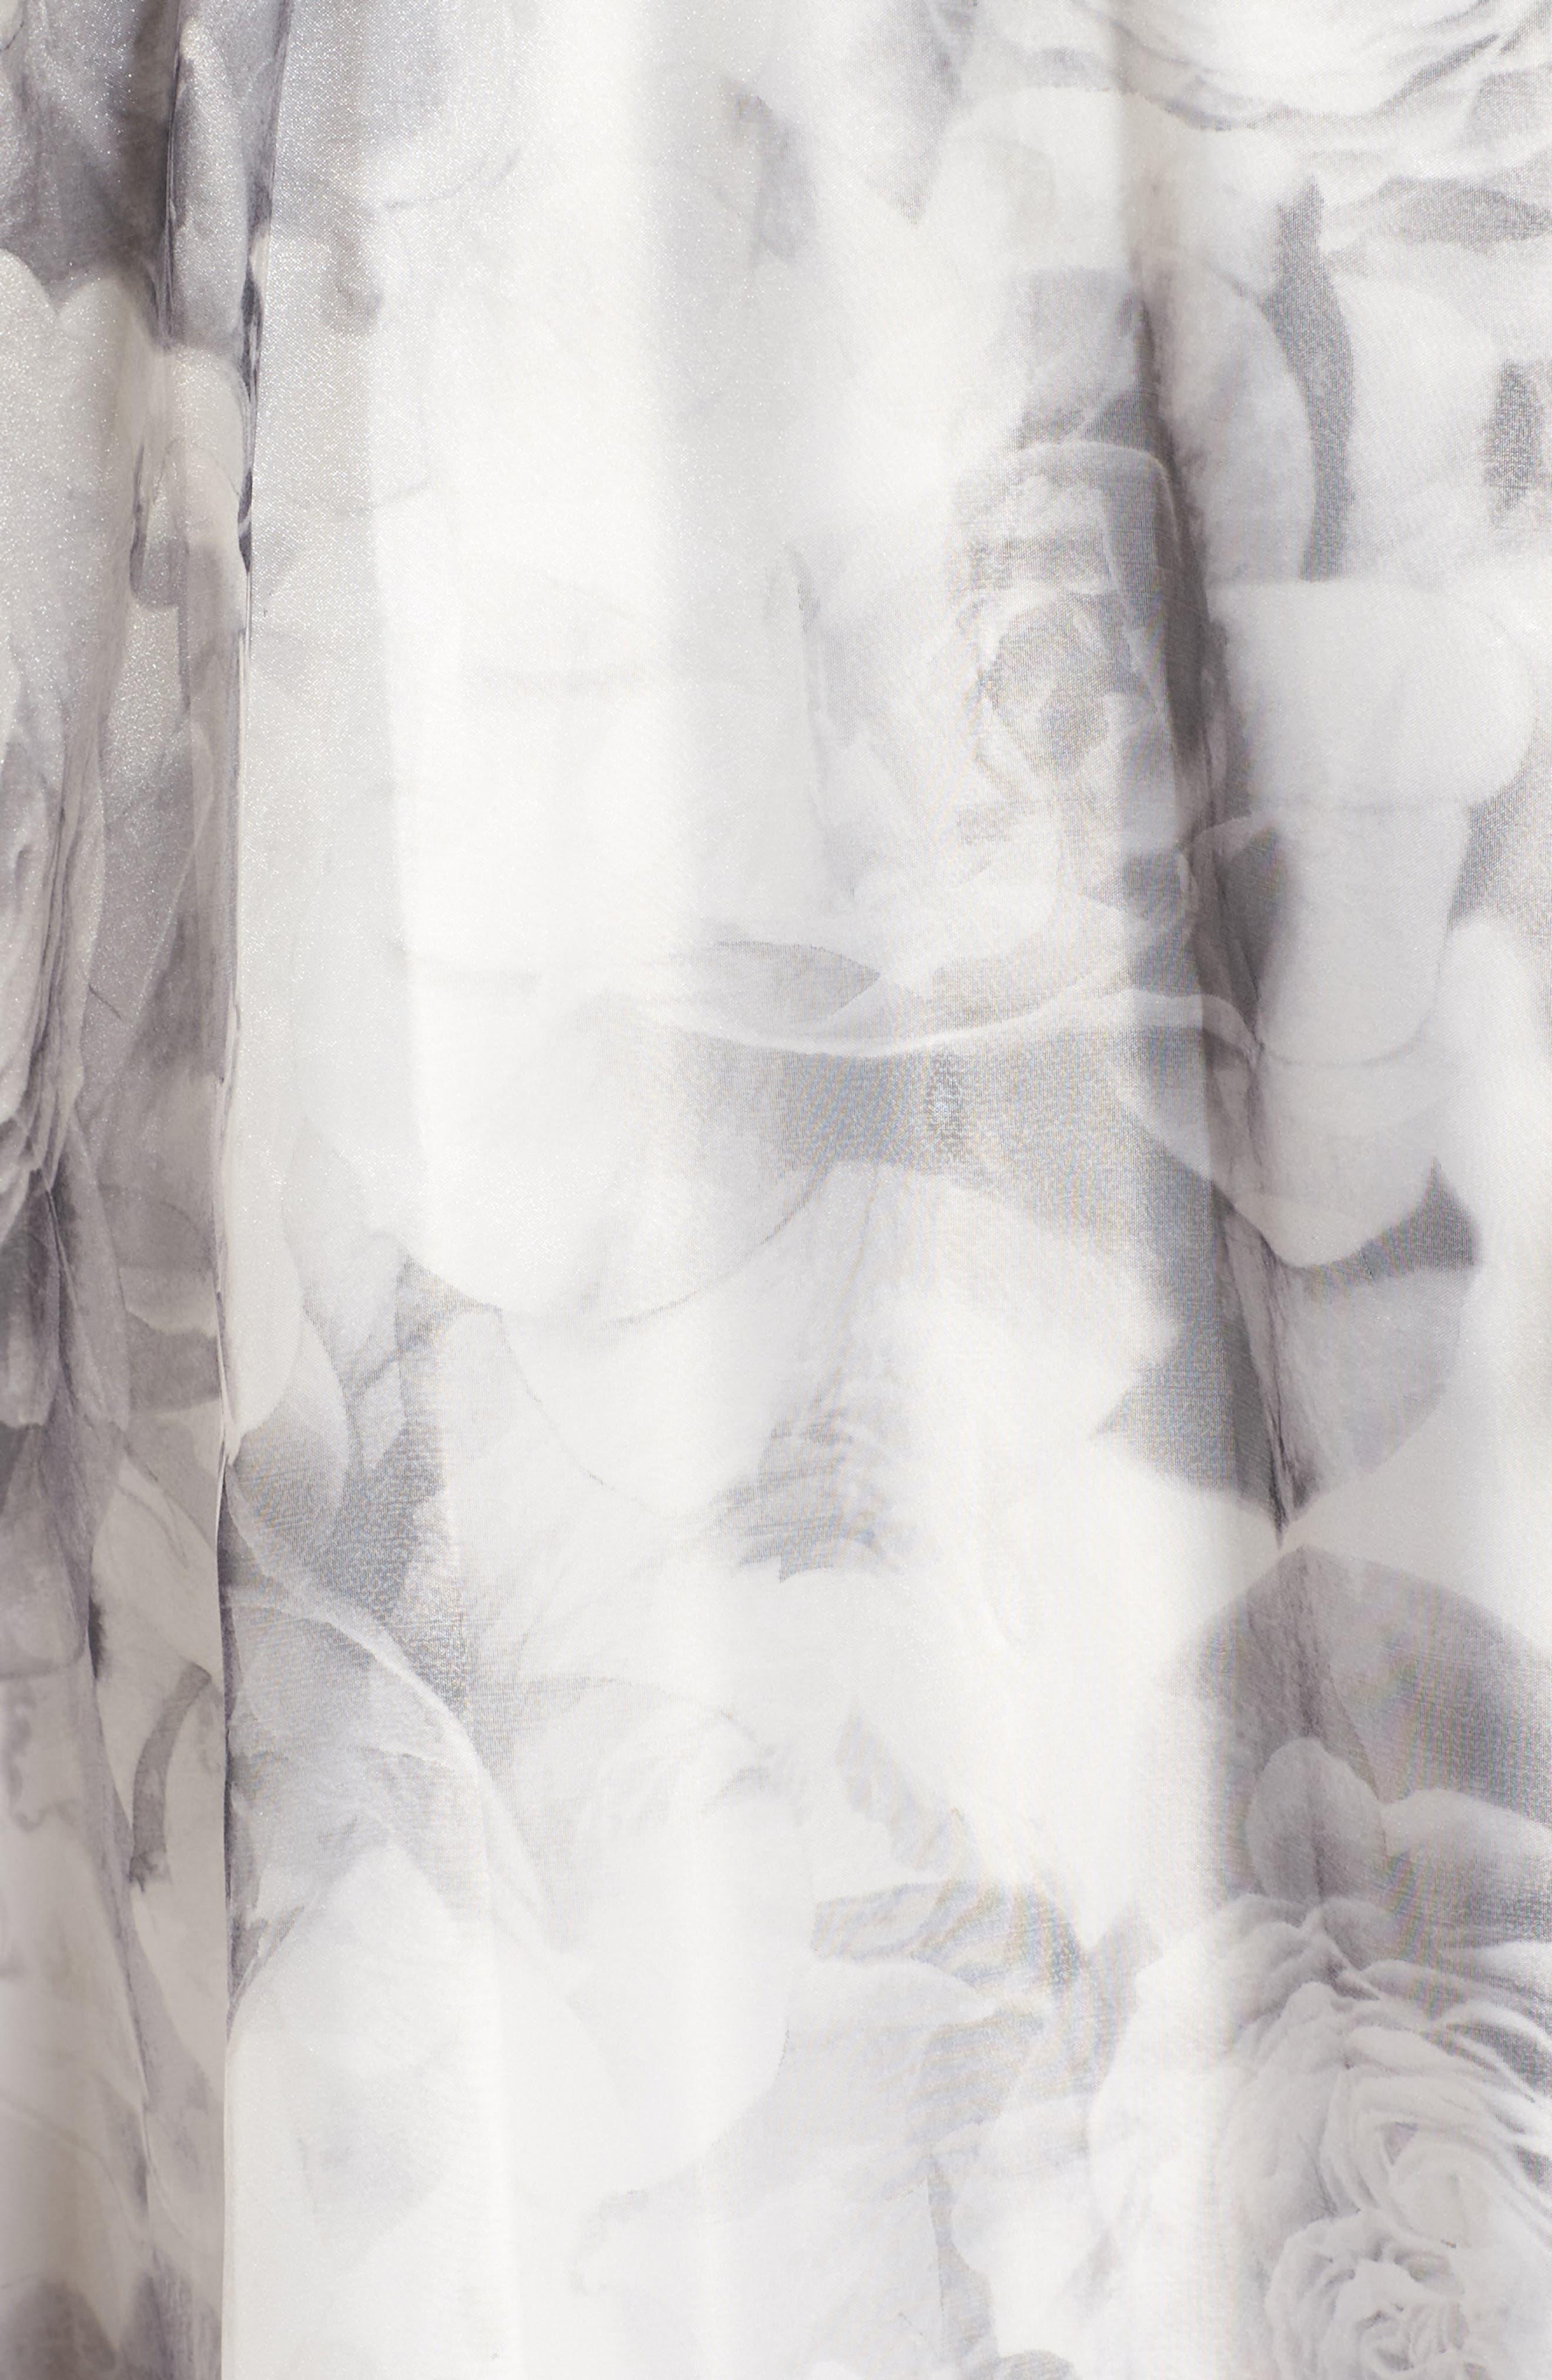 Embellished Neck Rose Print Ballgown,                             Alternate thumbnail 5, color,                             Black/ White